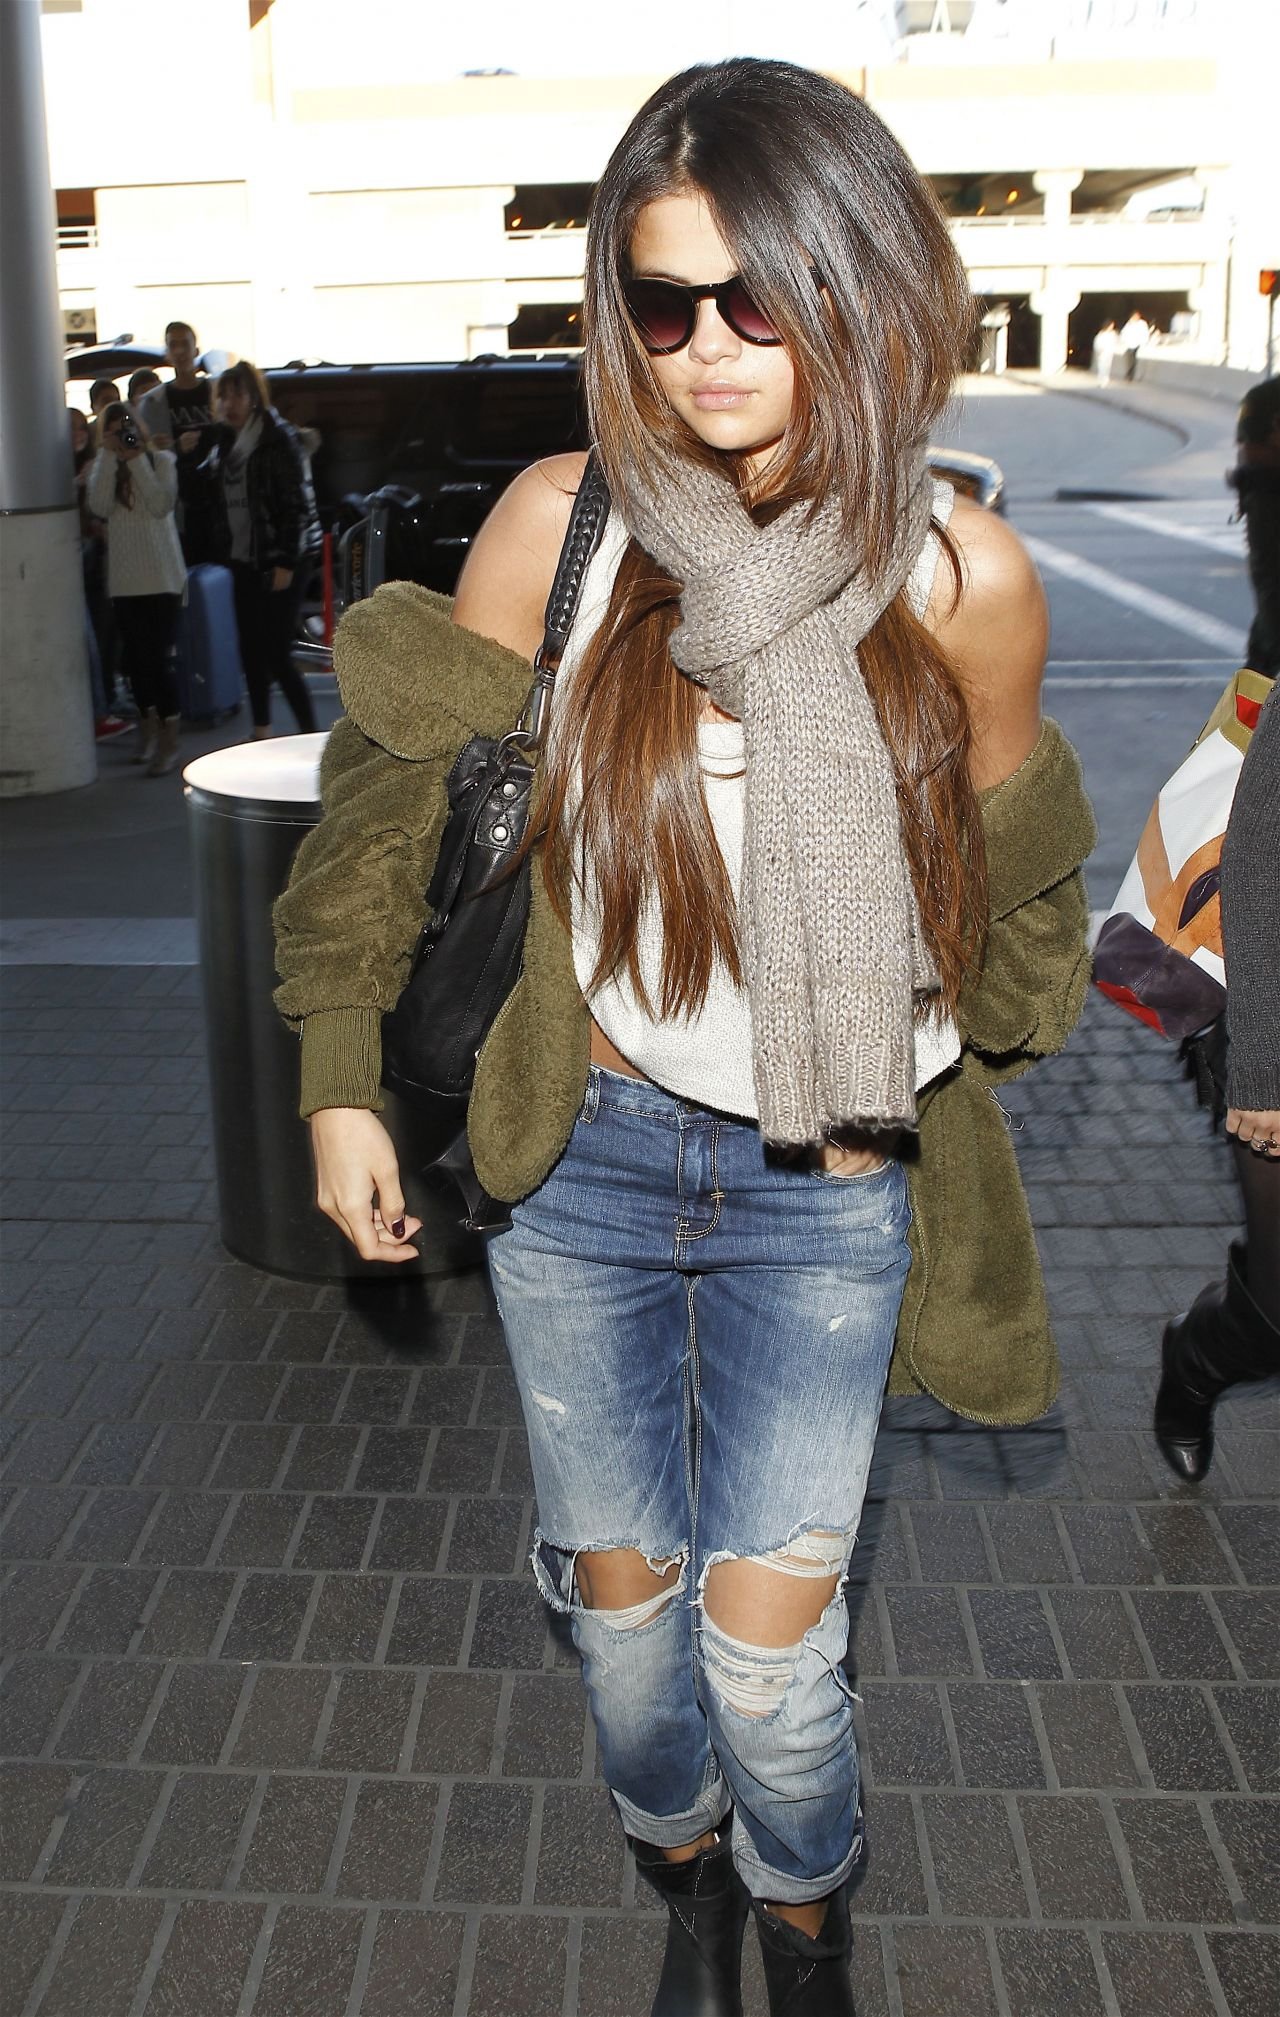 Selena Gomez Street Style At Lax Airport February 2014